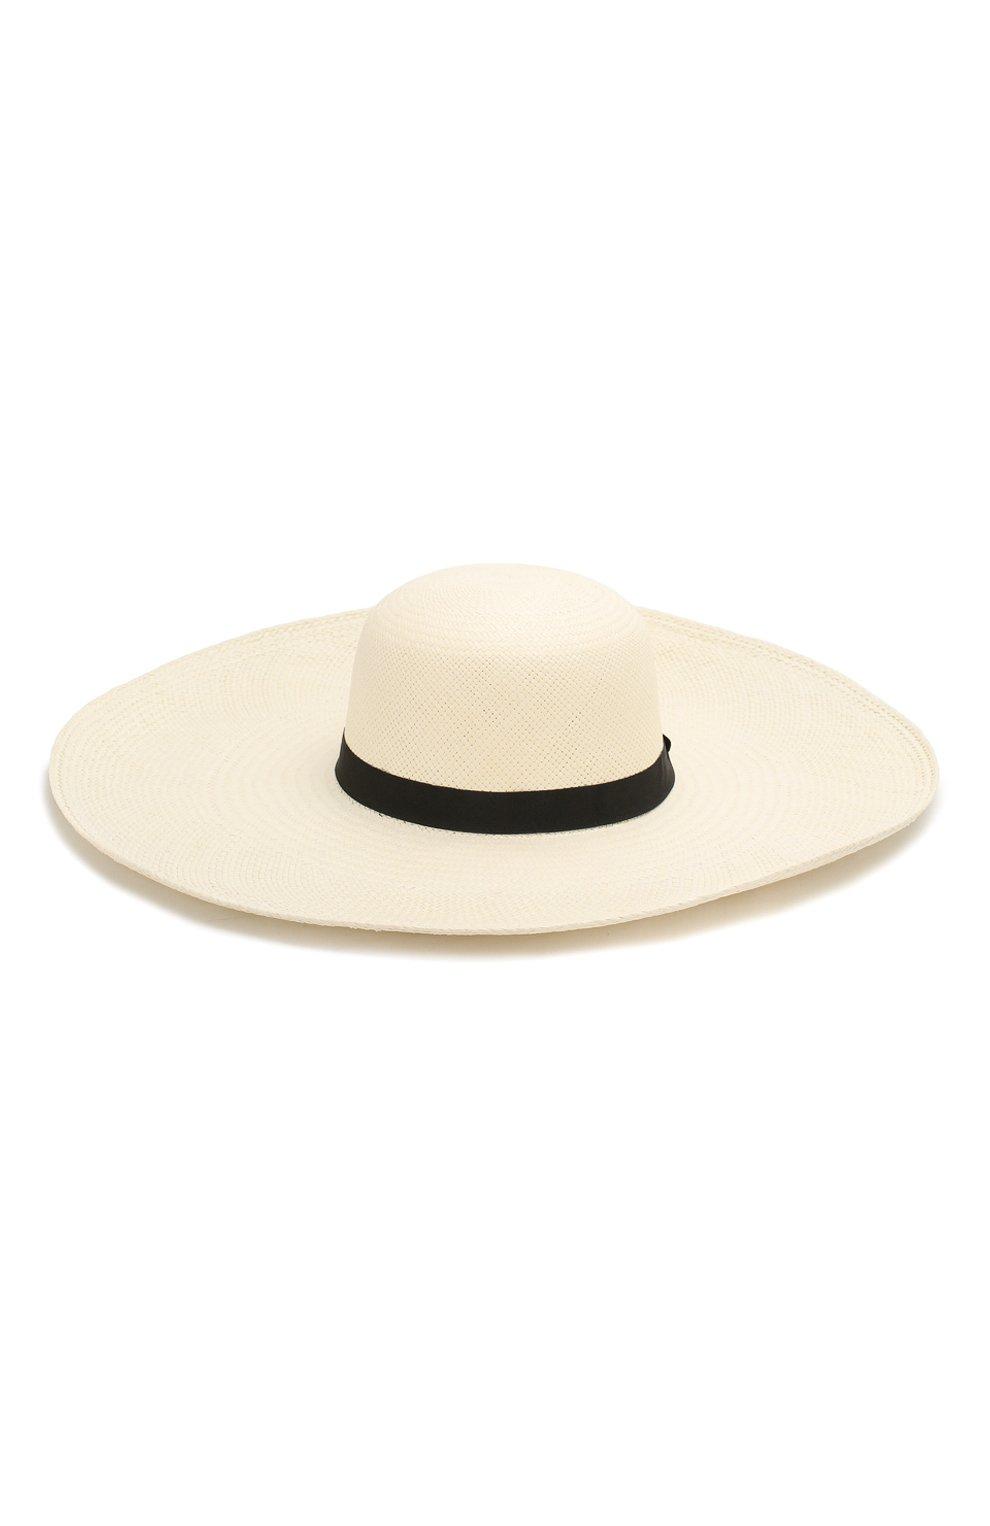 Женская шляпа anastasia CANOE белого цвета, арт. 1964820 | Фото 1